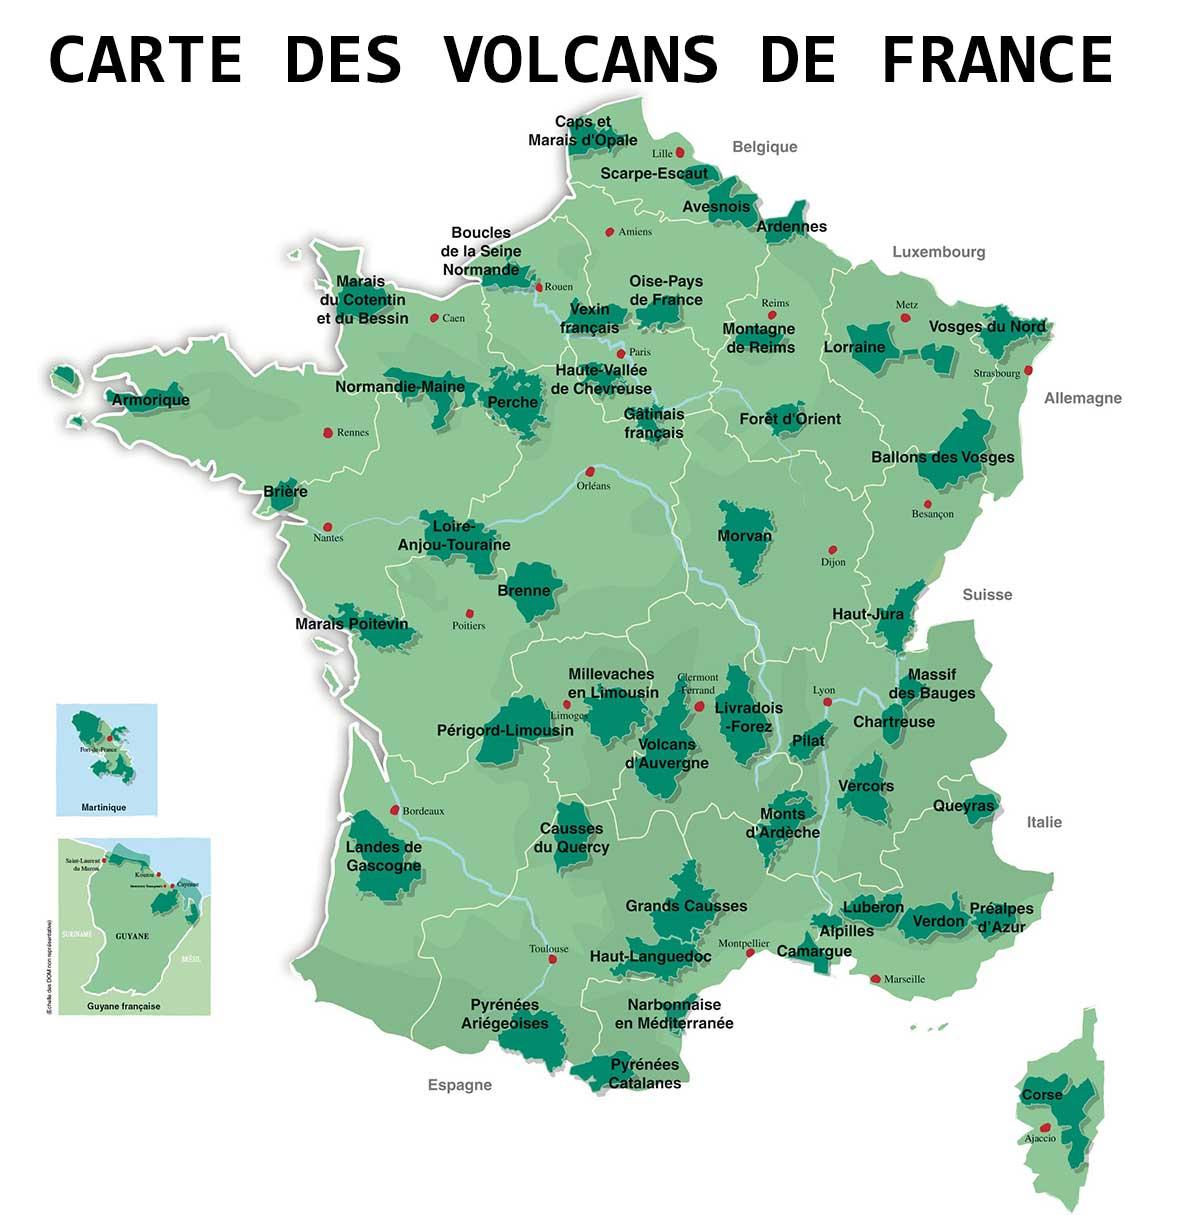 volcans-de-france